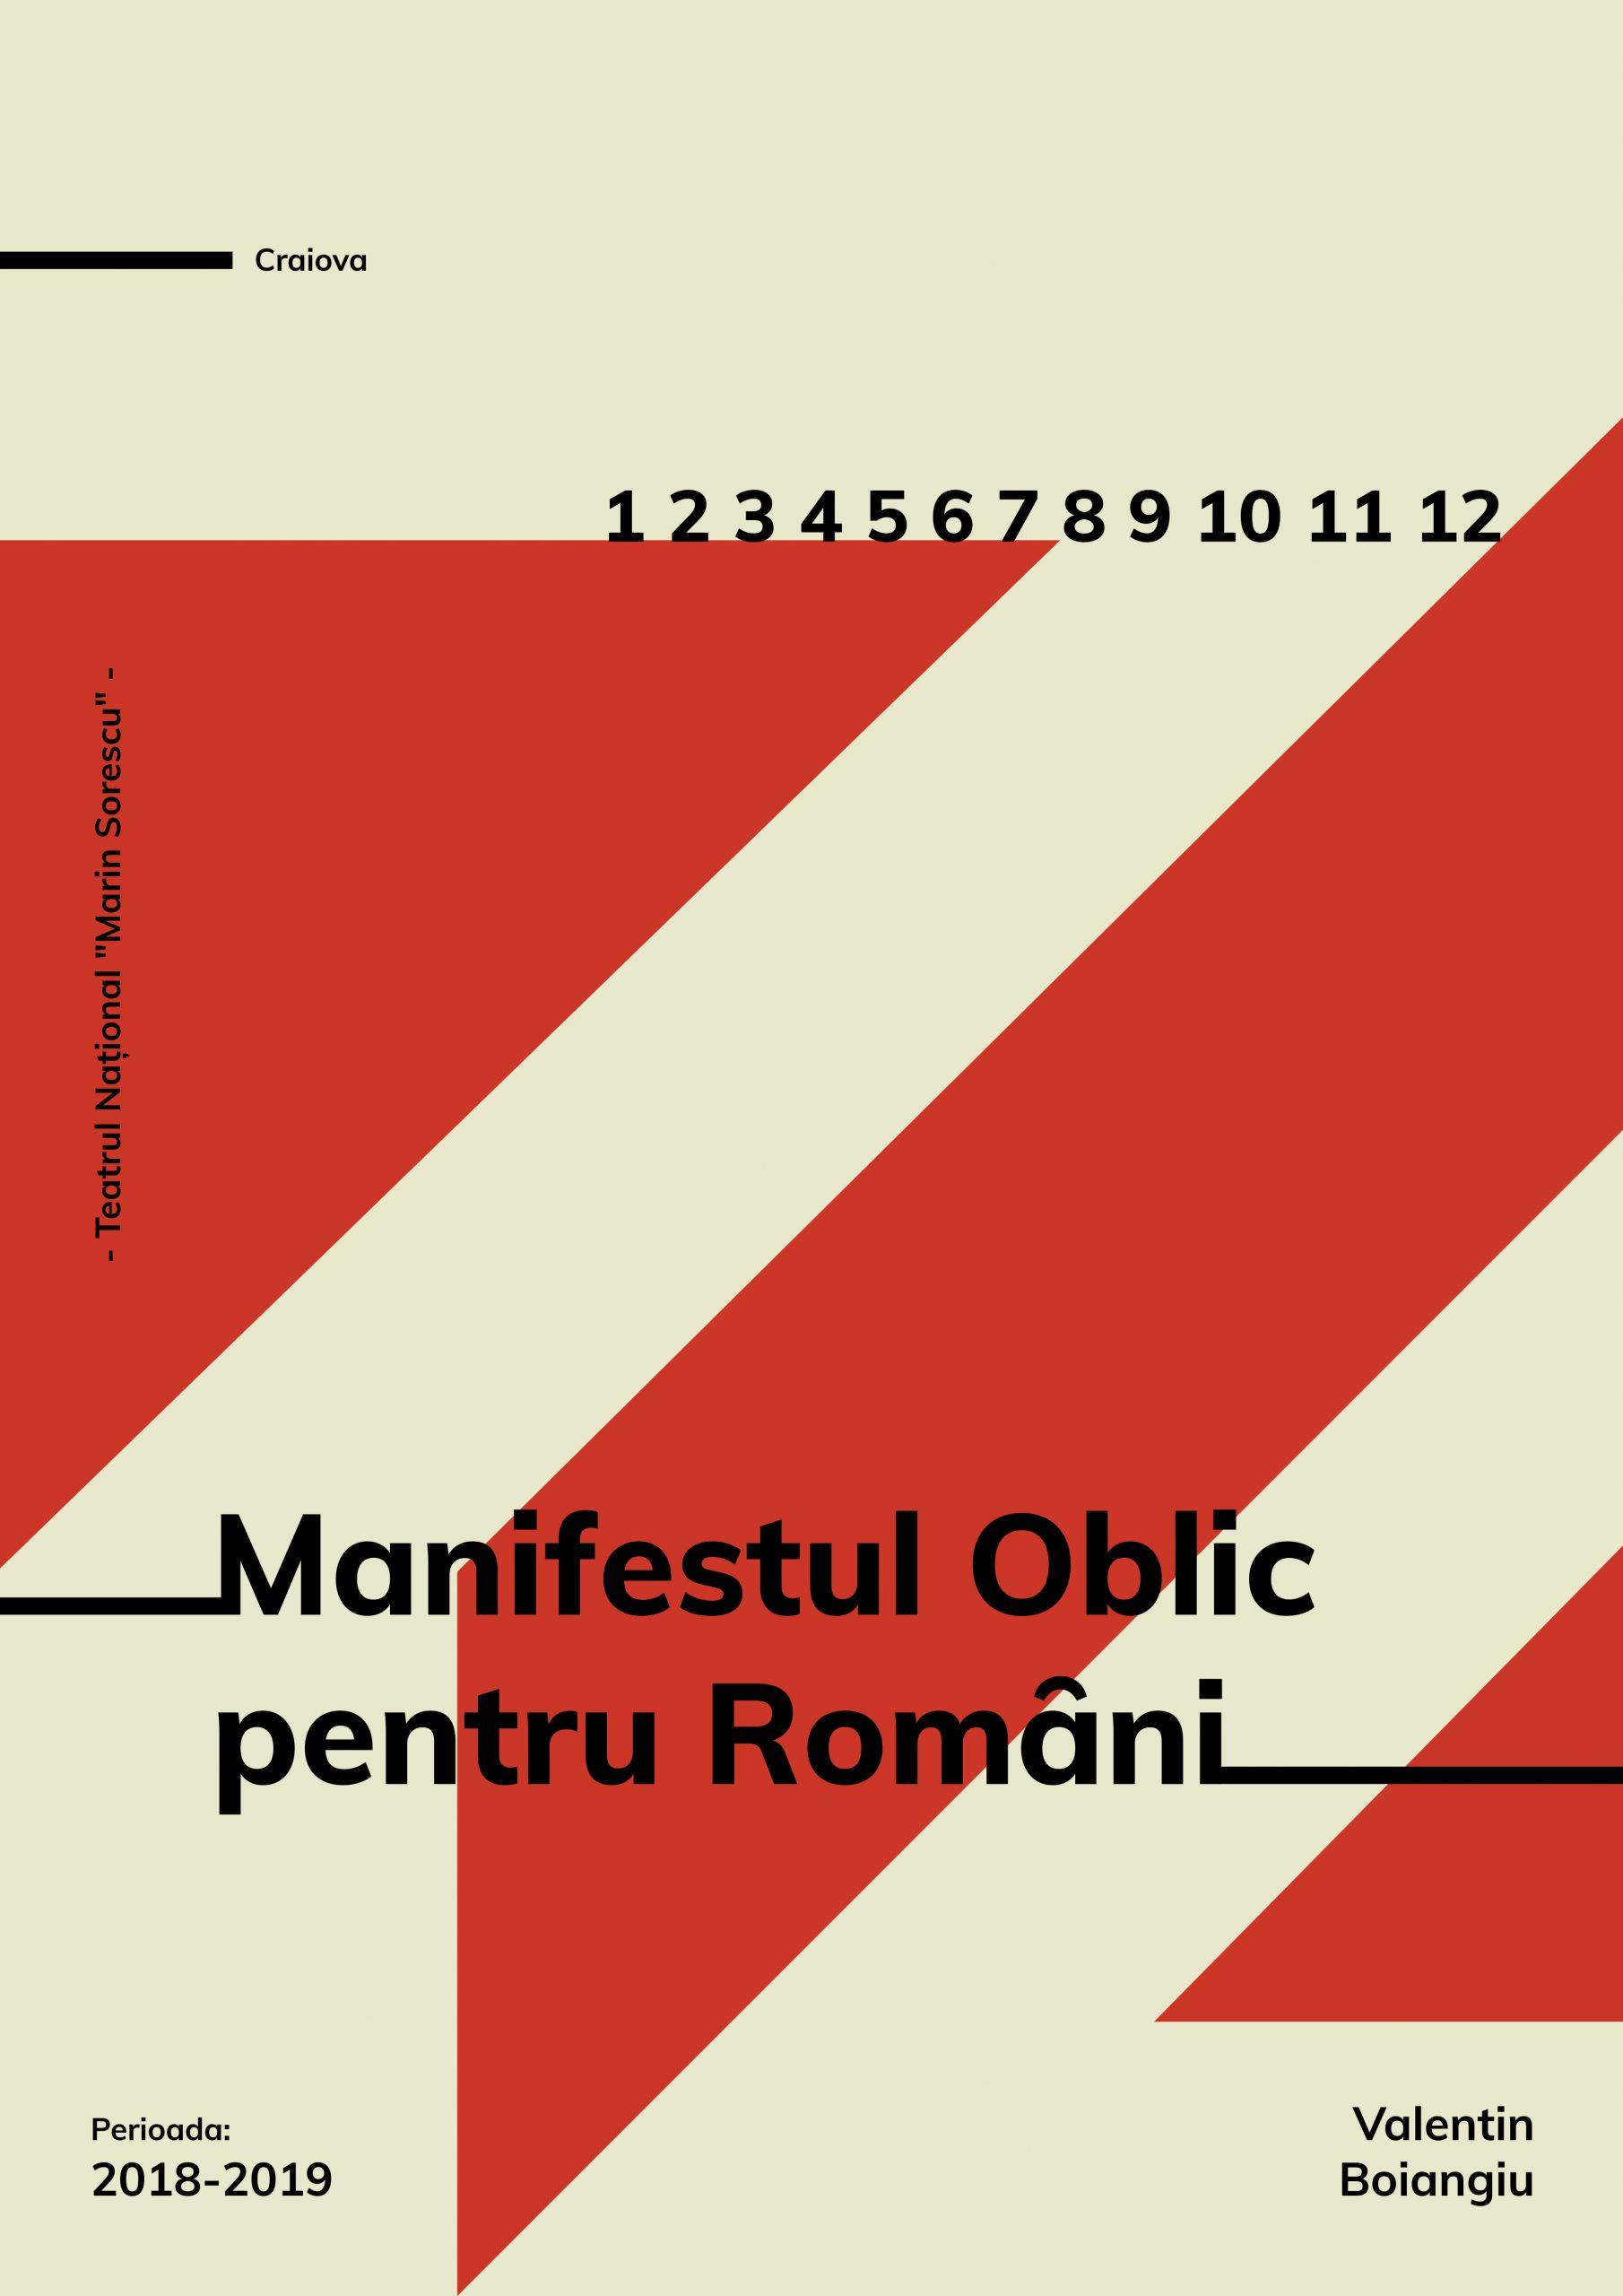 manifest-poster